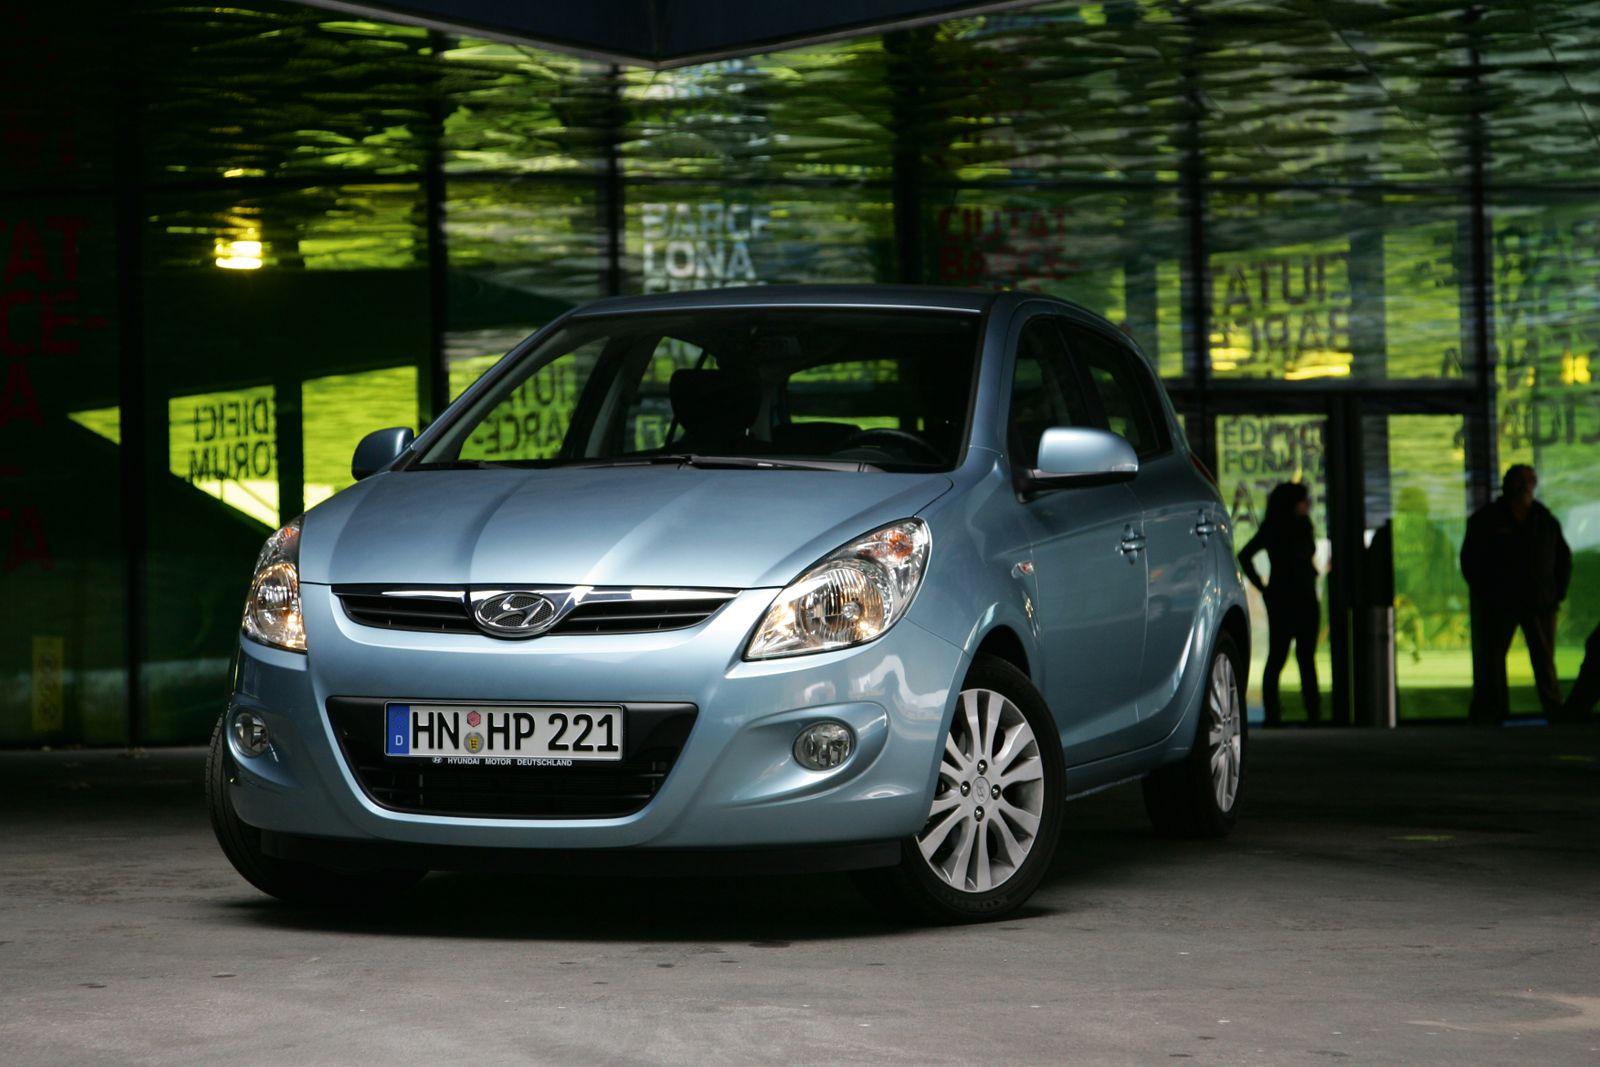 Hyundai i20 / Indien